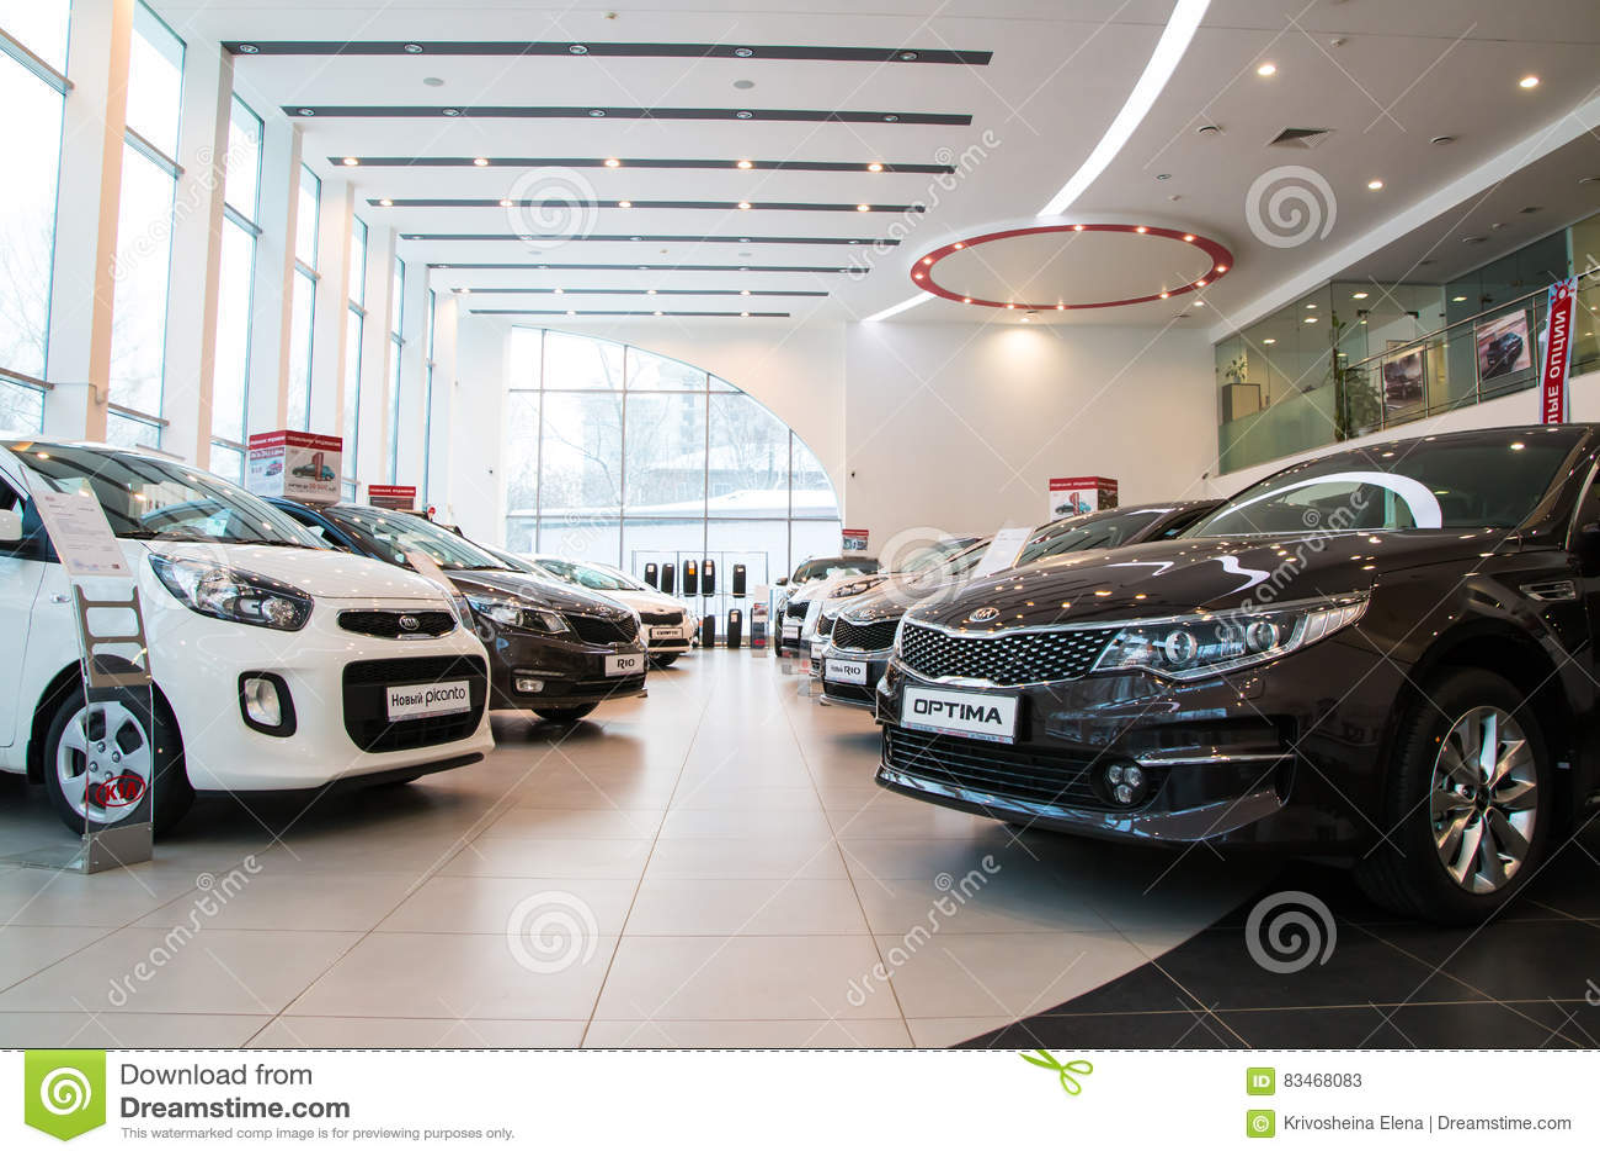 Kia motors russia for Motor city car dealership